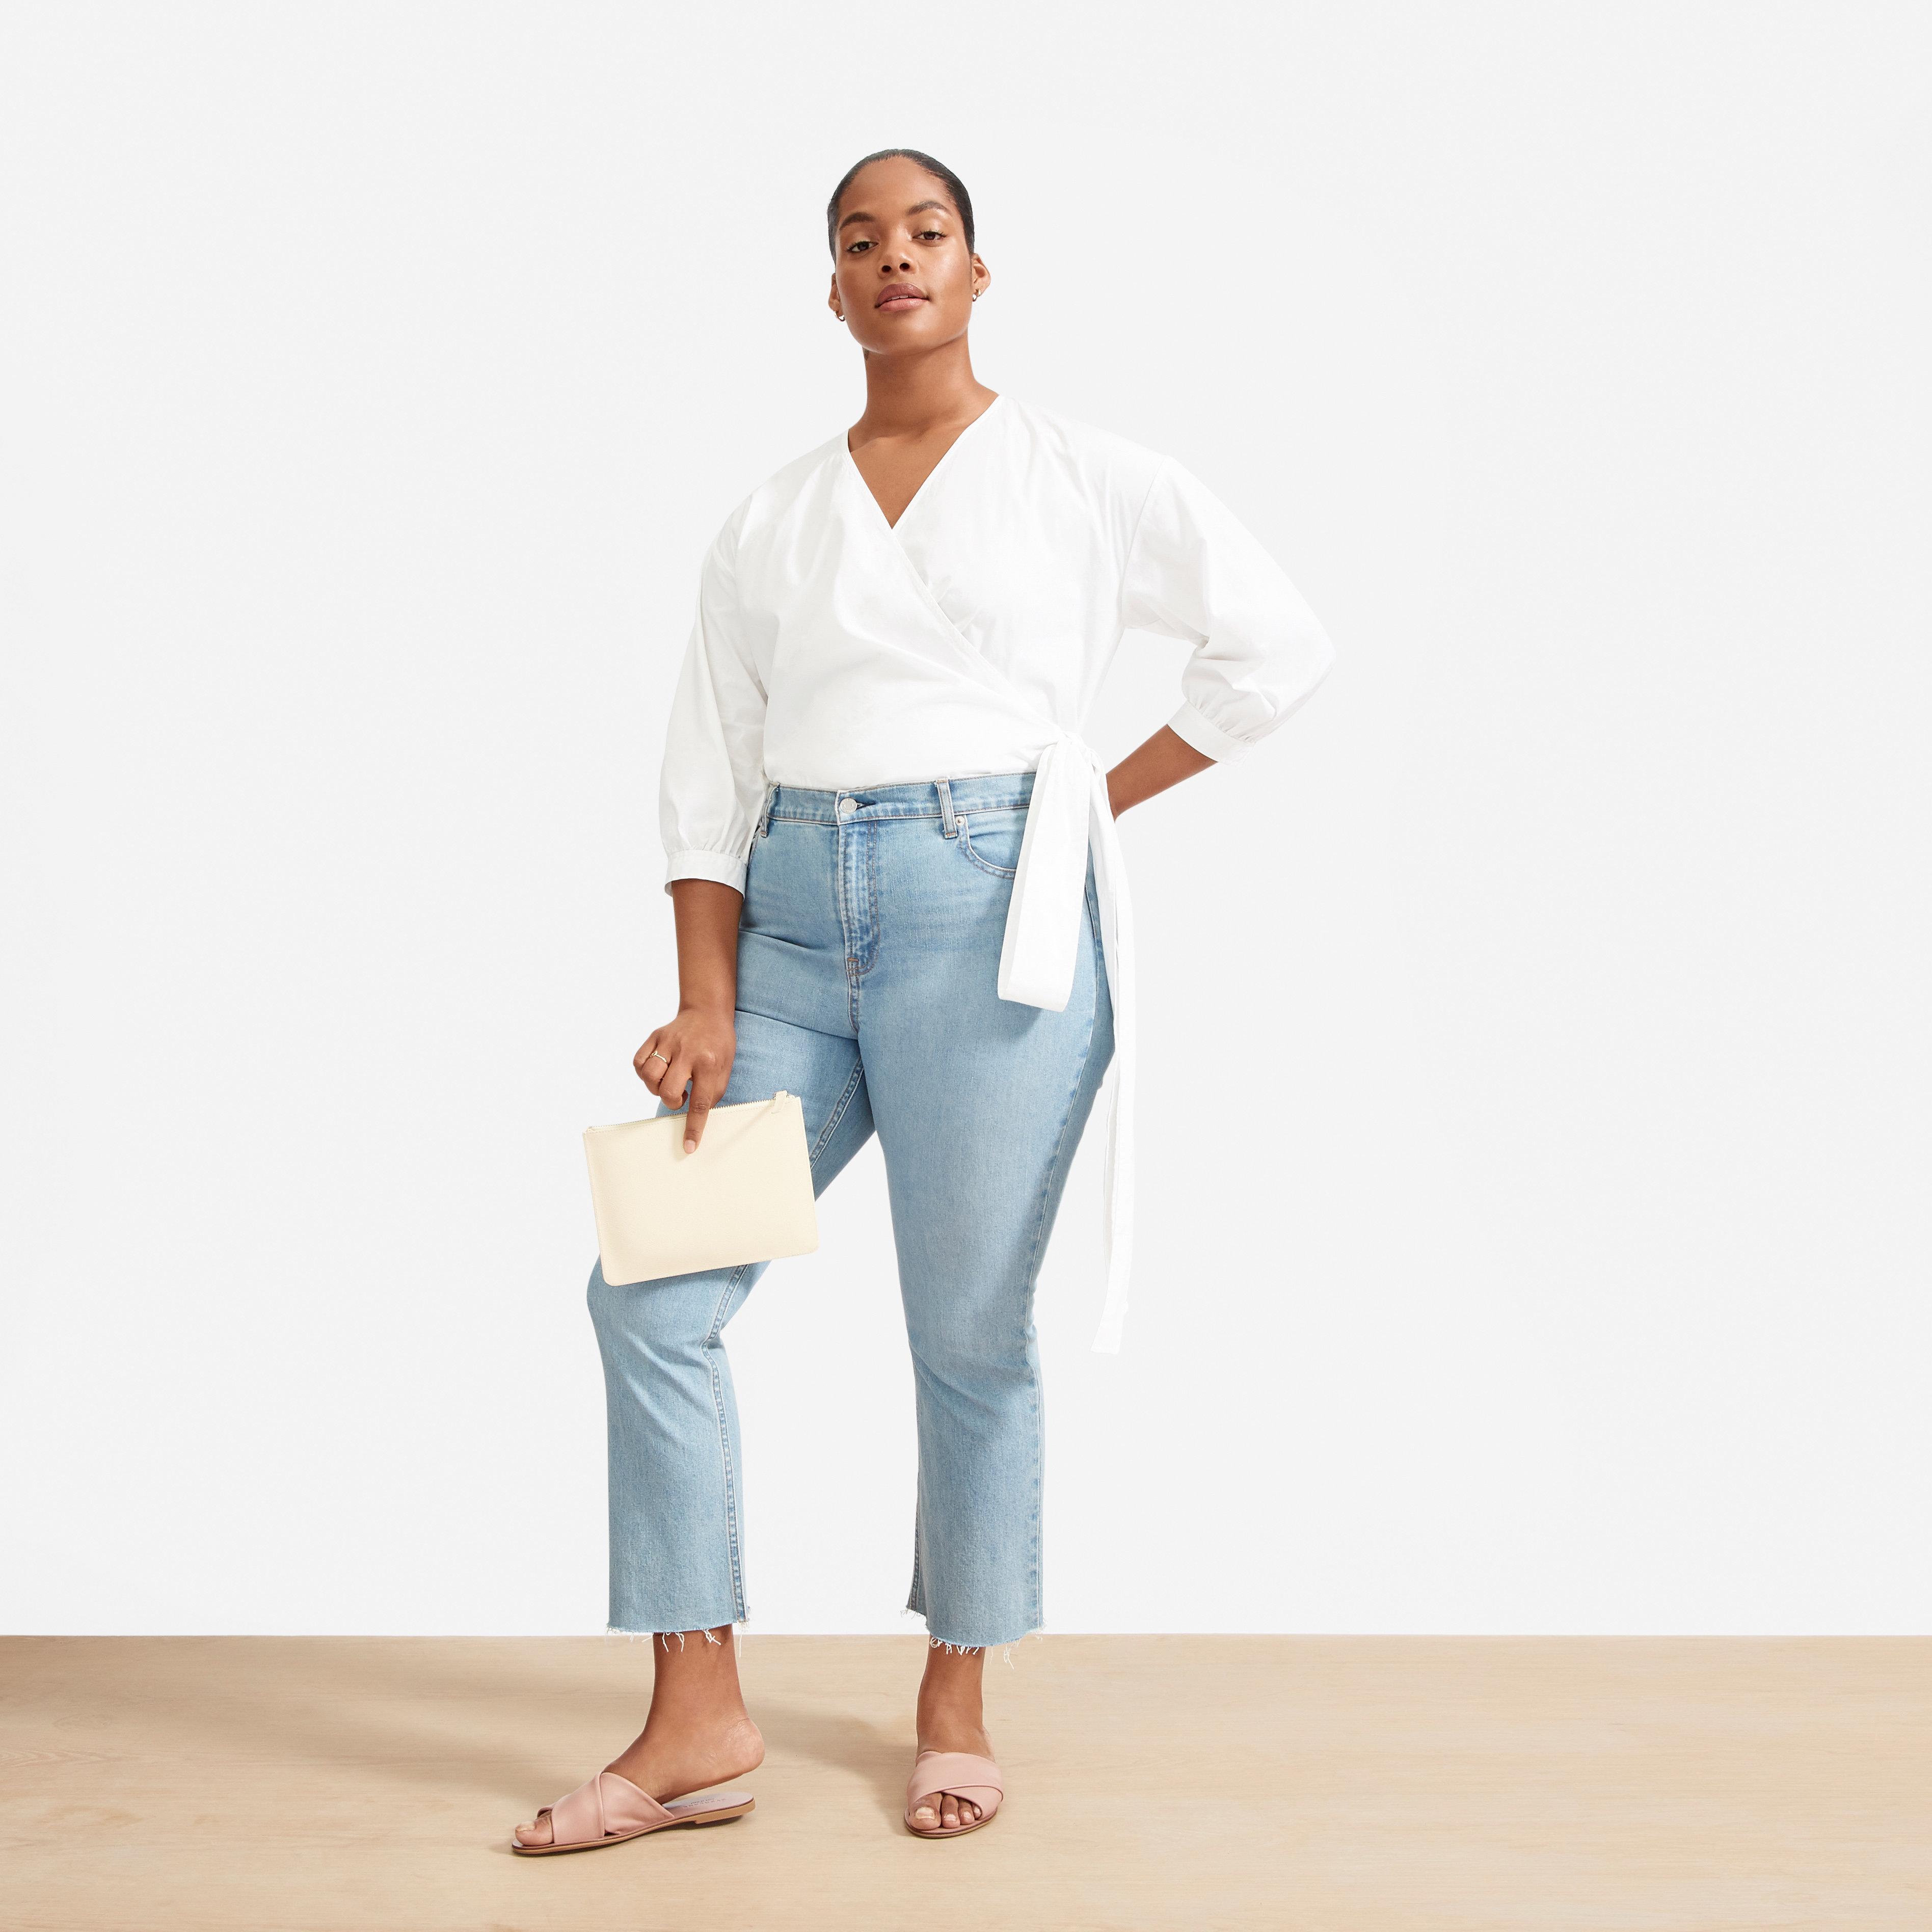 da2989b66e2e97 Women's Shirts, Tops & Silk Blouses | Everlane